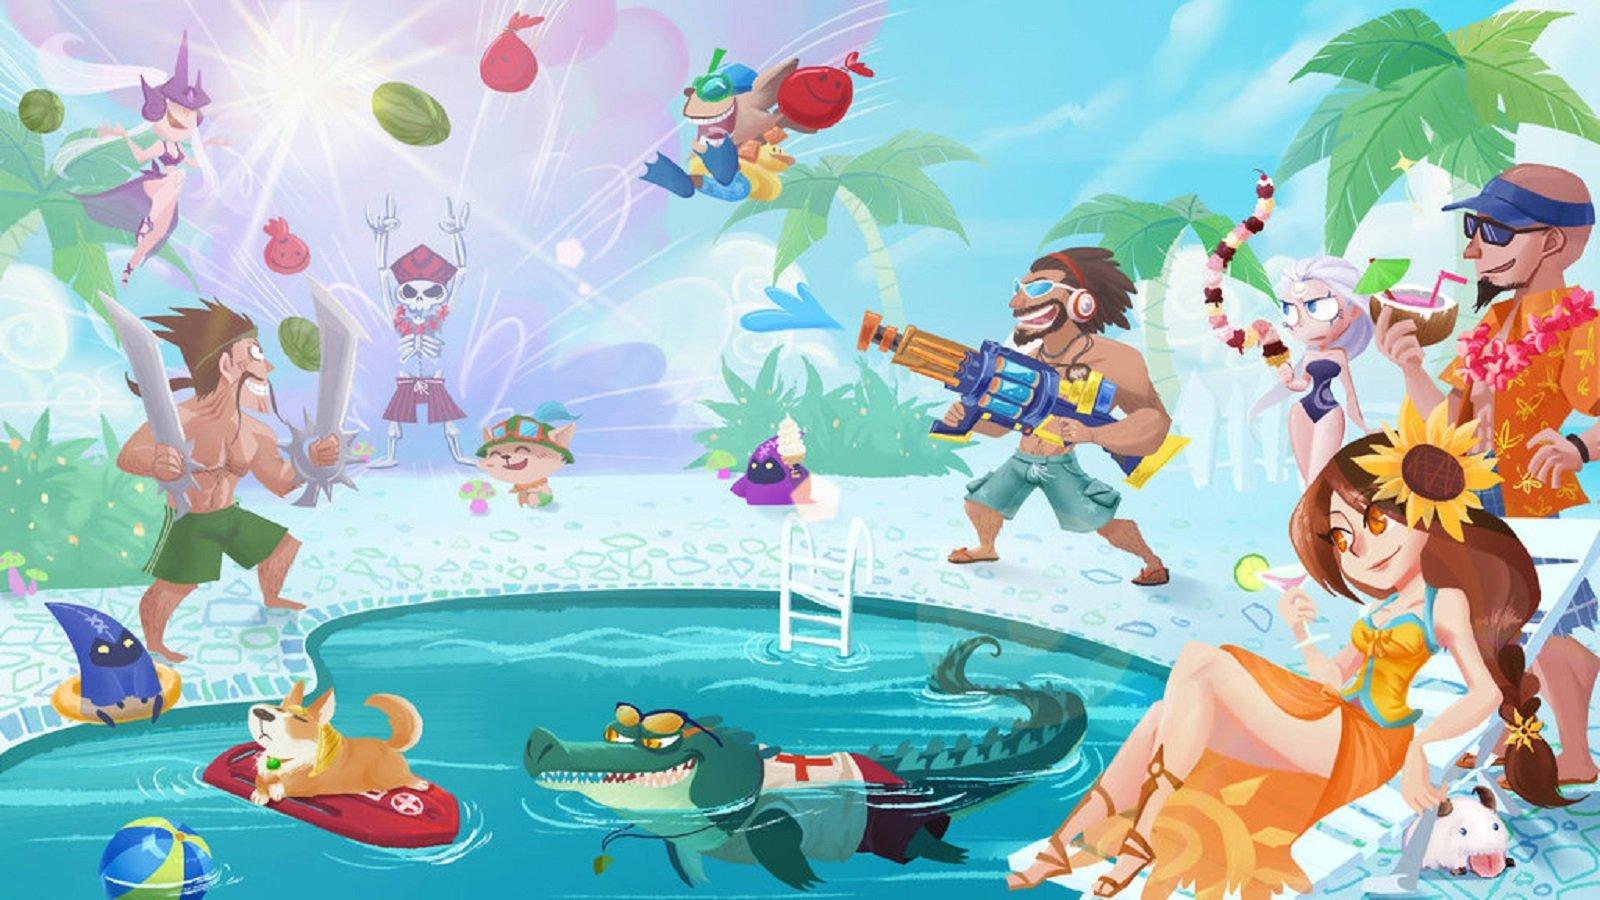 League of Legends Pool Party wallpaper | 1600x900 | 621679 ...